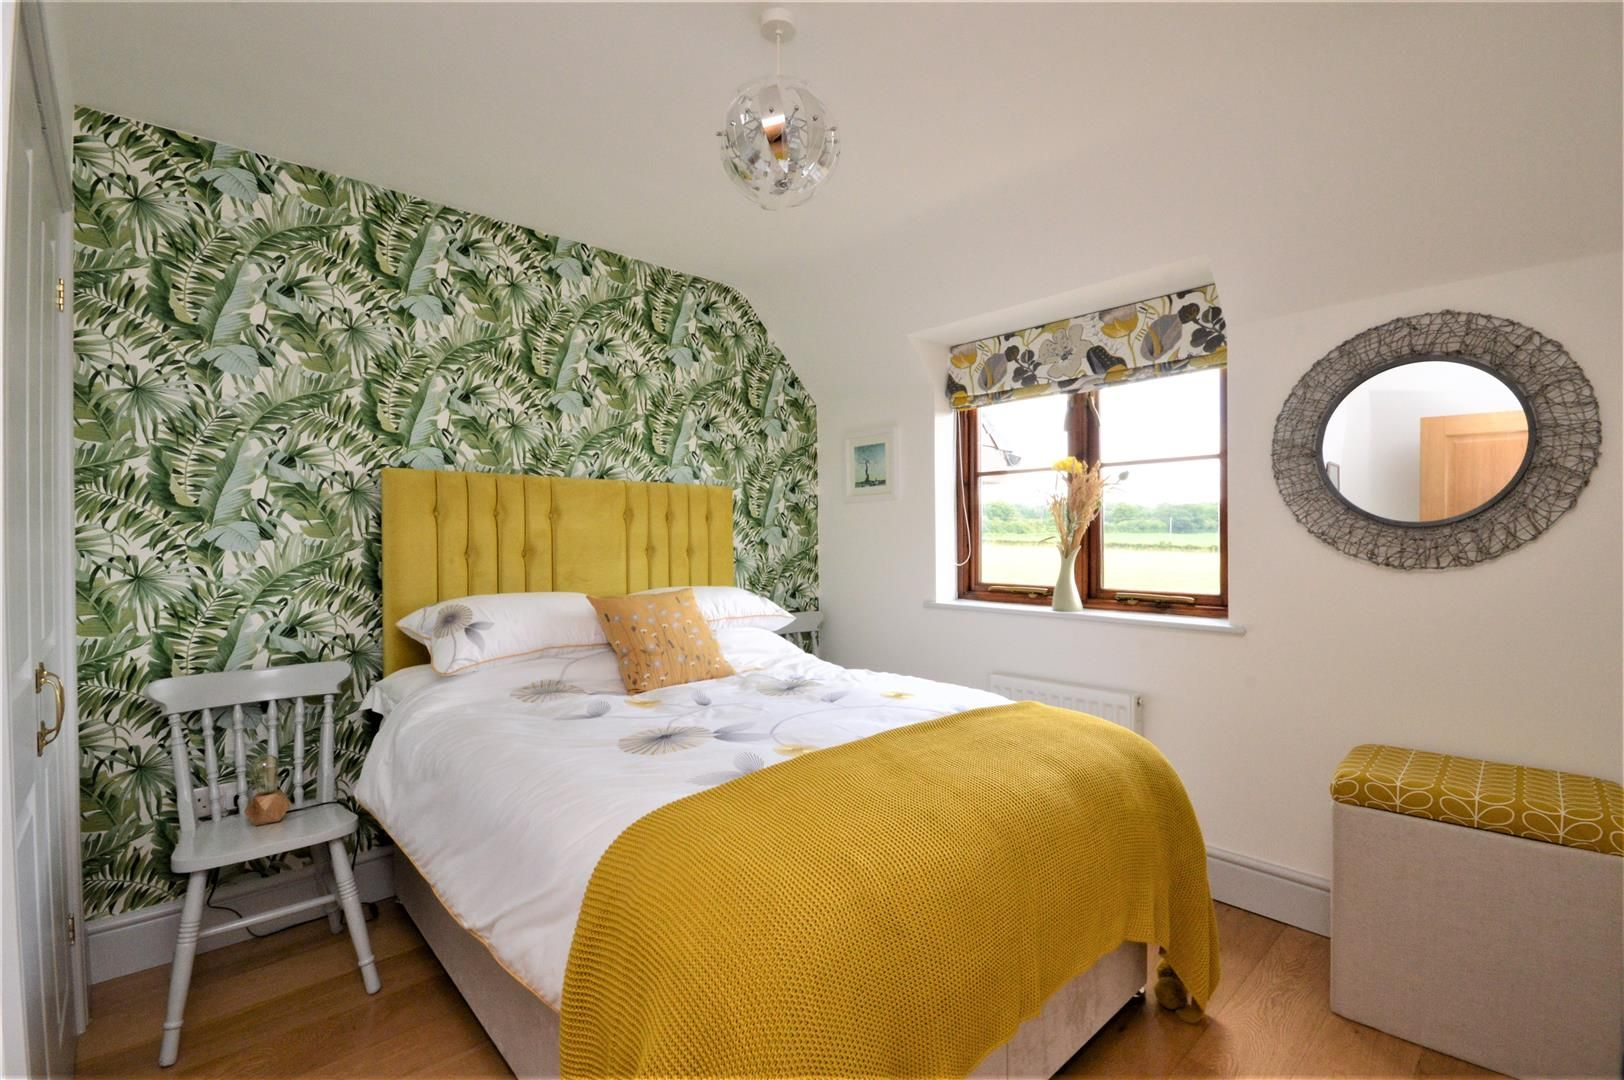 4 bed detached for sale in Eardisley 13